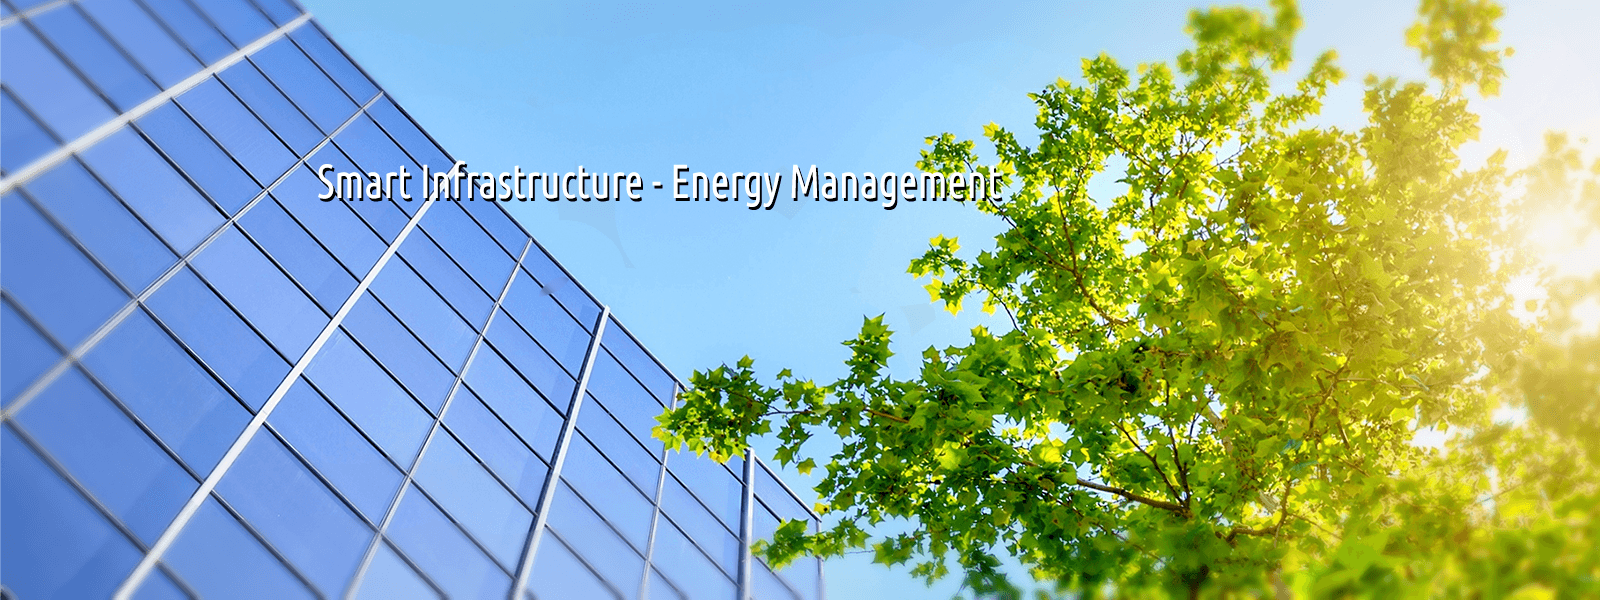 Smart infrastructure - Energy Management